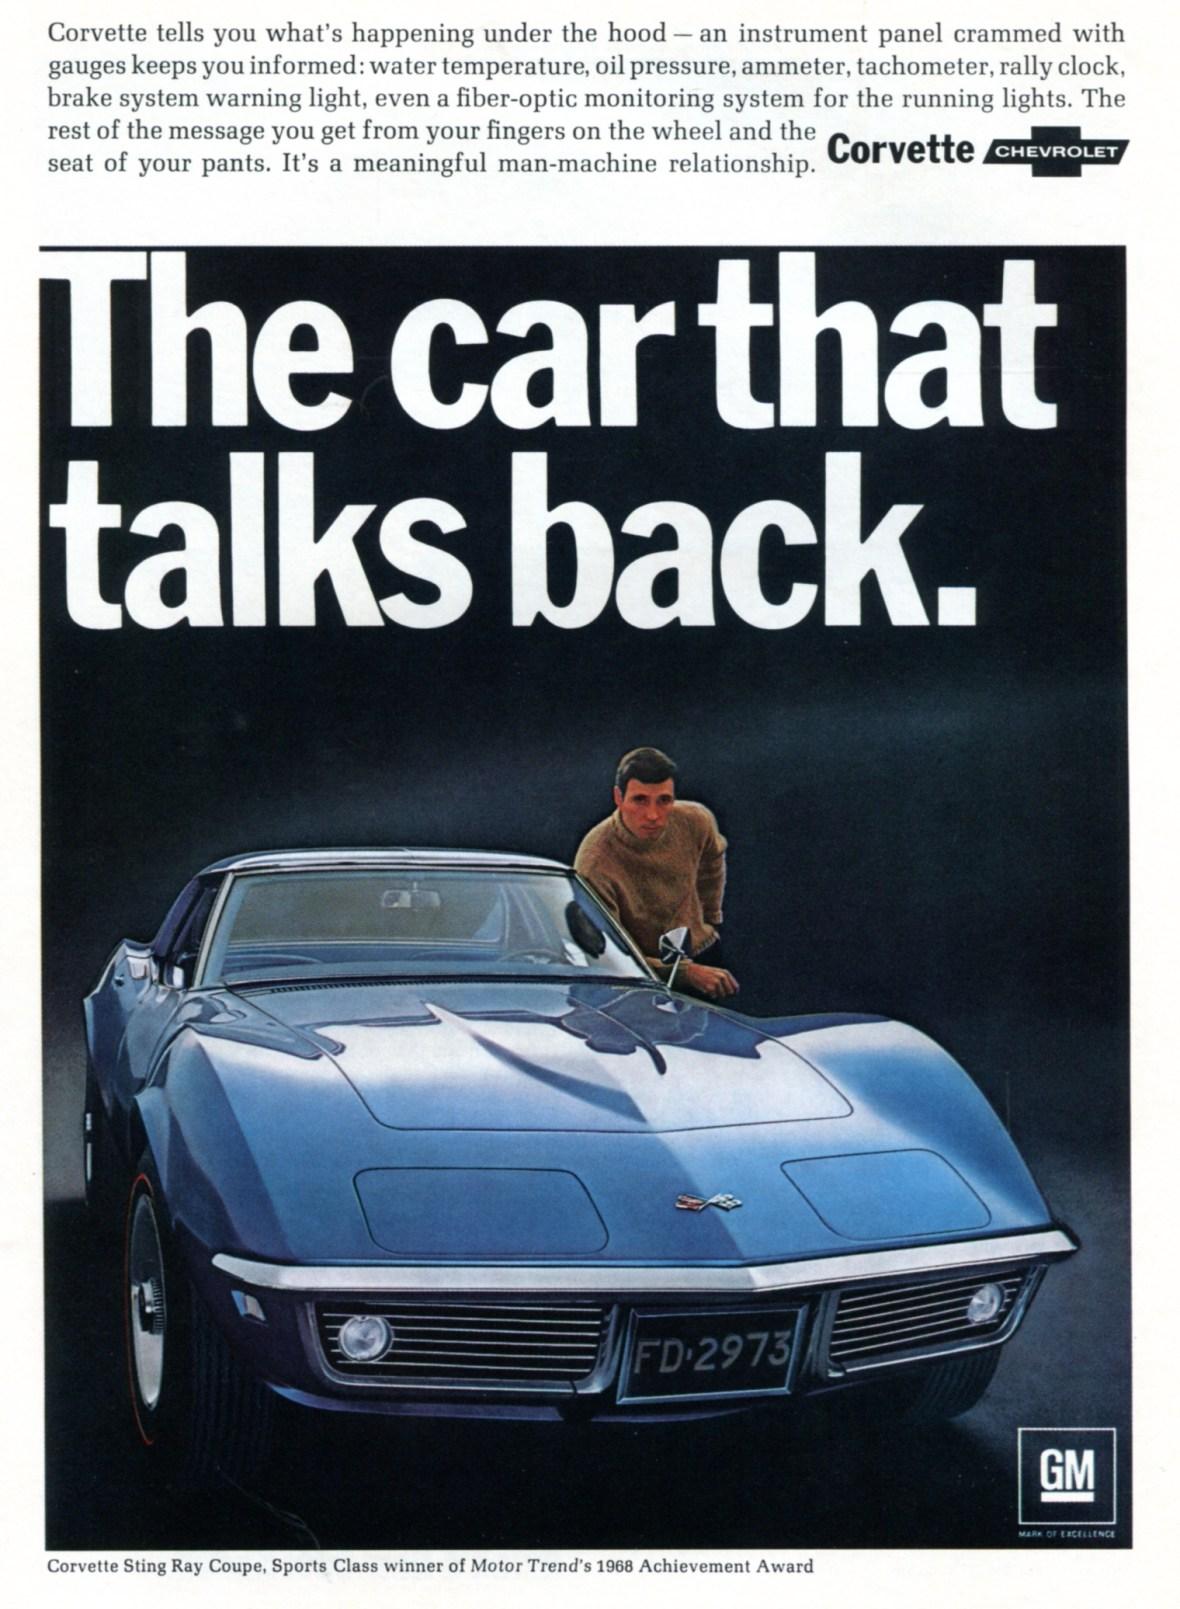 1968 Chevrolet Corvette Sting Ray Coupe